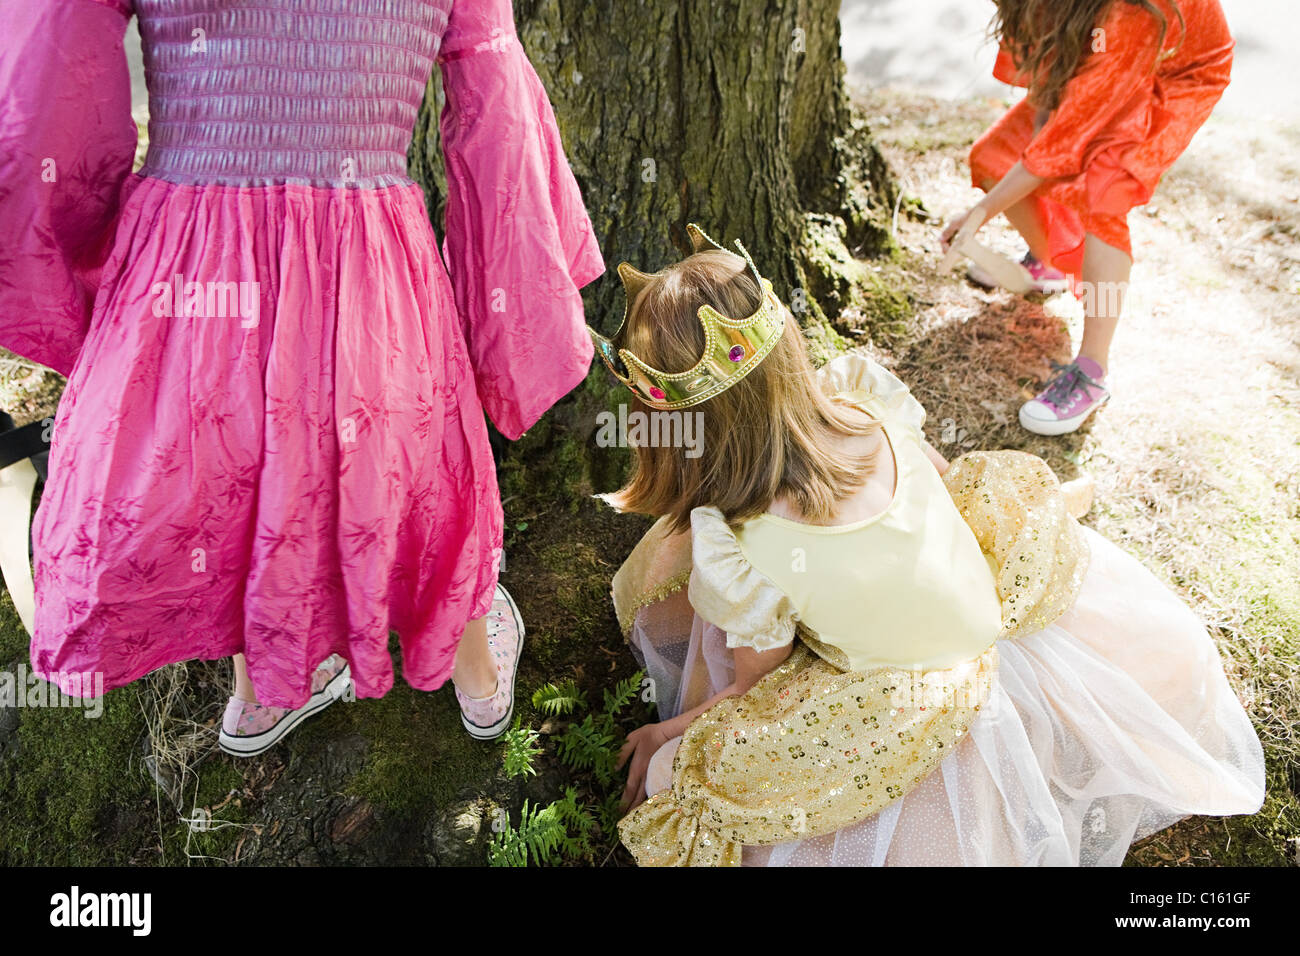 Yellow Dresses Imágenes De Stock & Yellow Dresses Fotos De Stock - Alamy